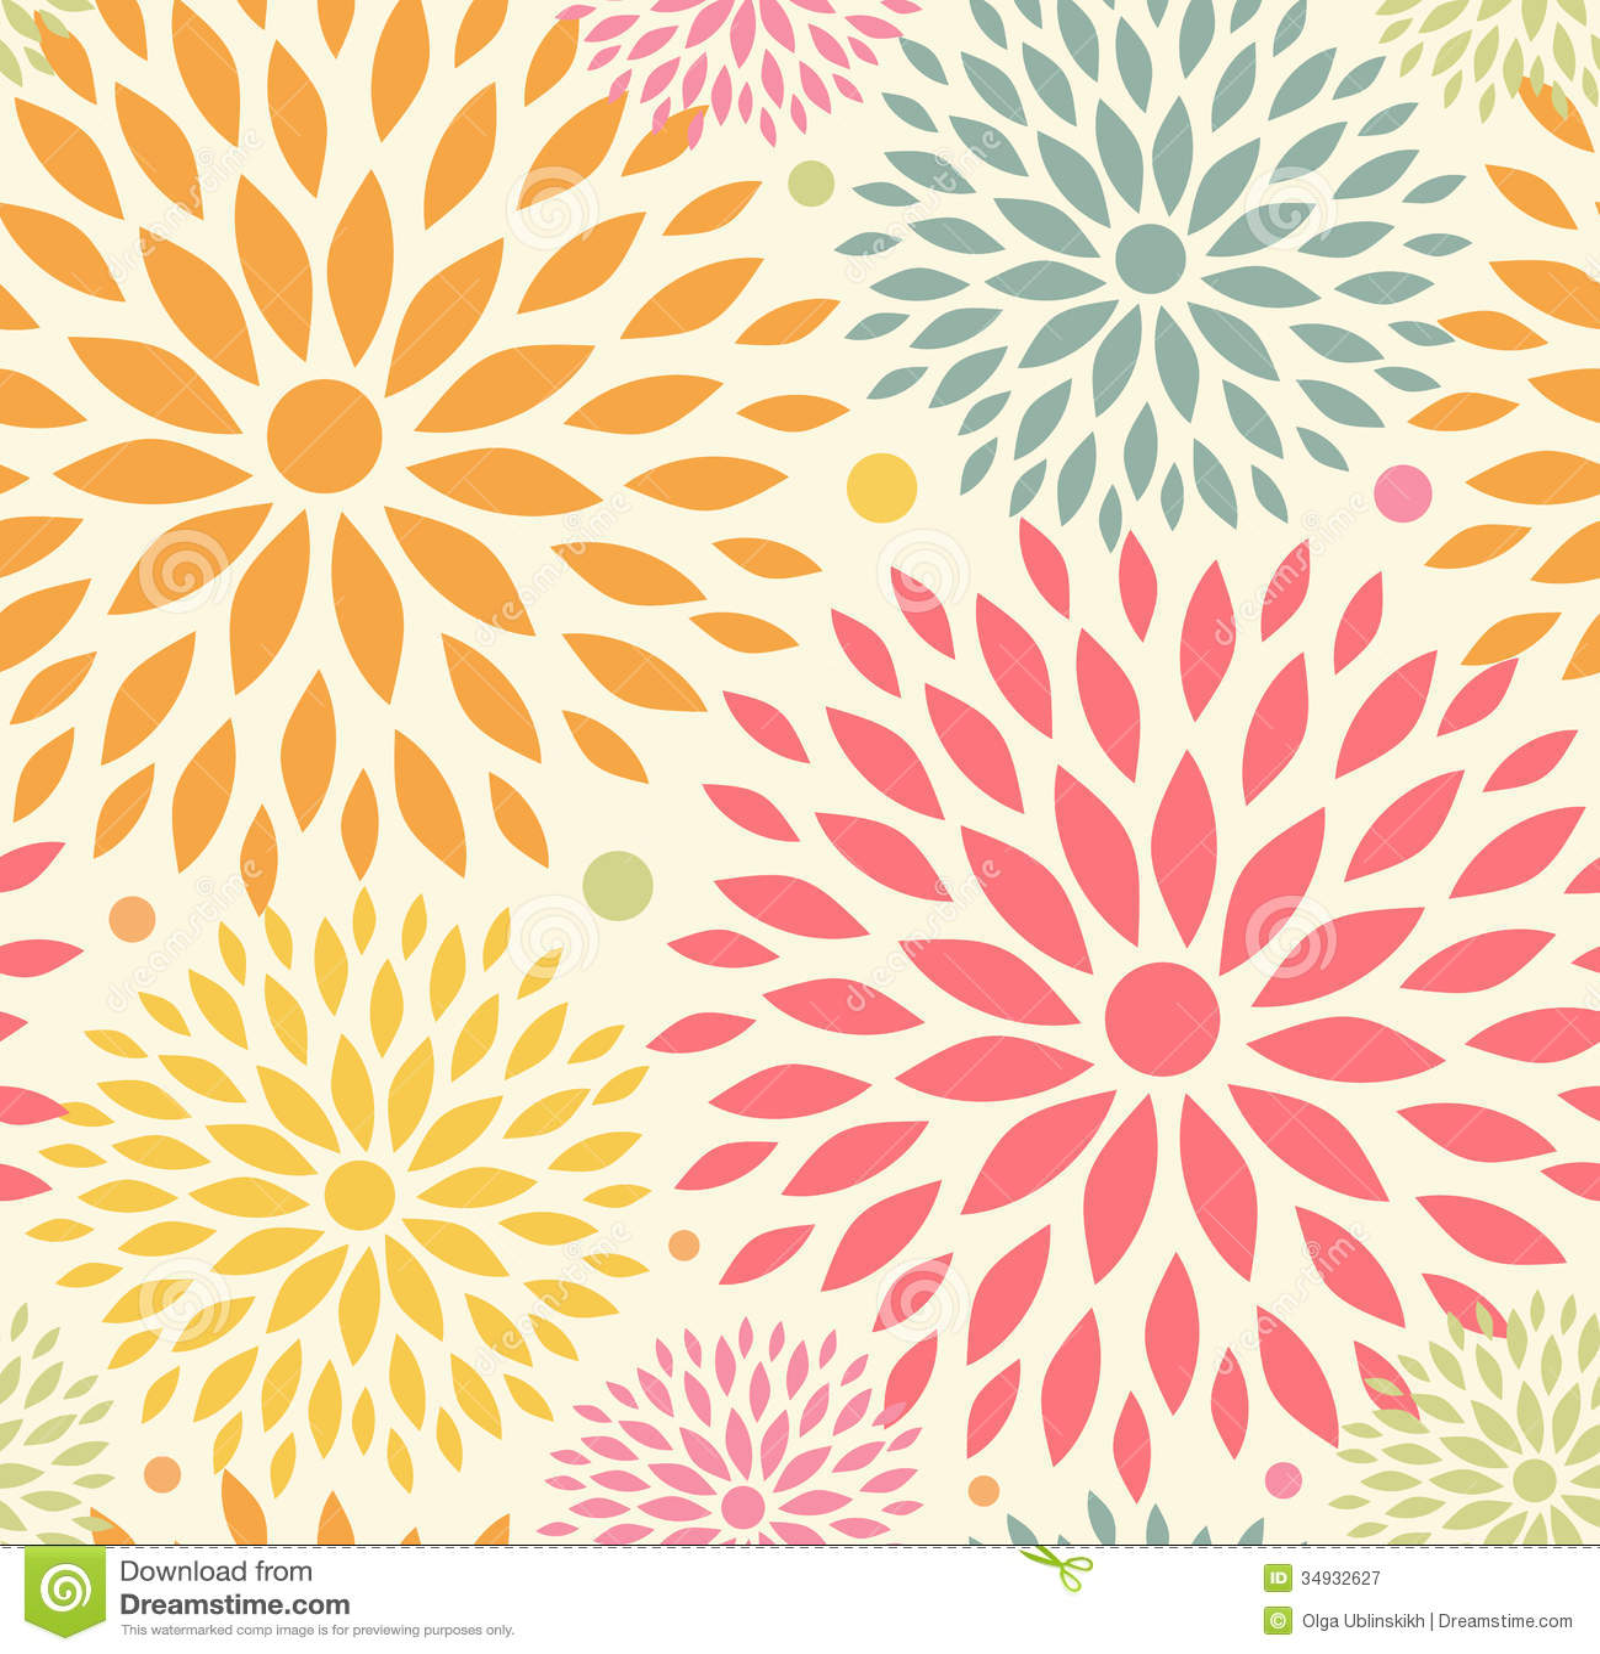 Seamless Ornamental Floral Pattern Decorative Cute Background